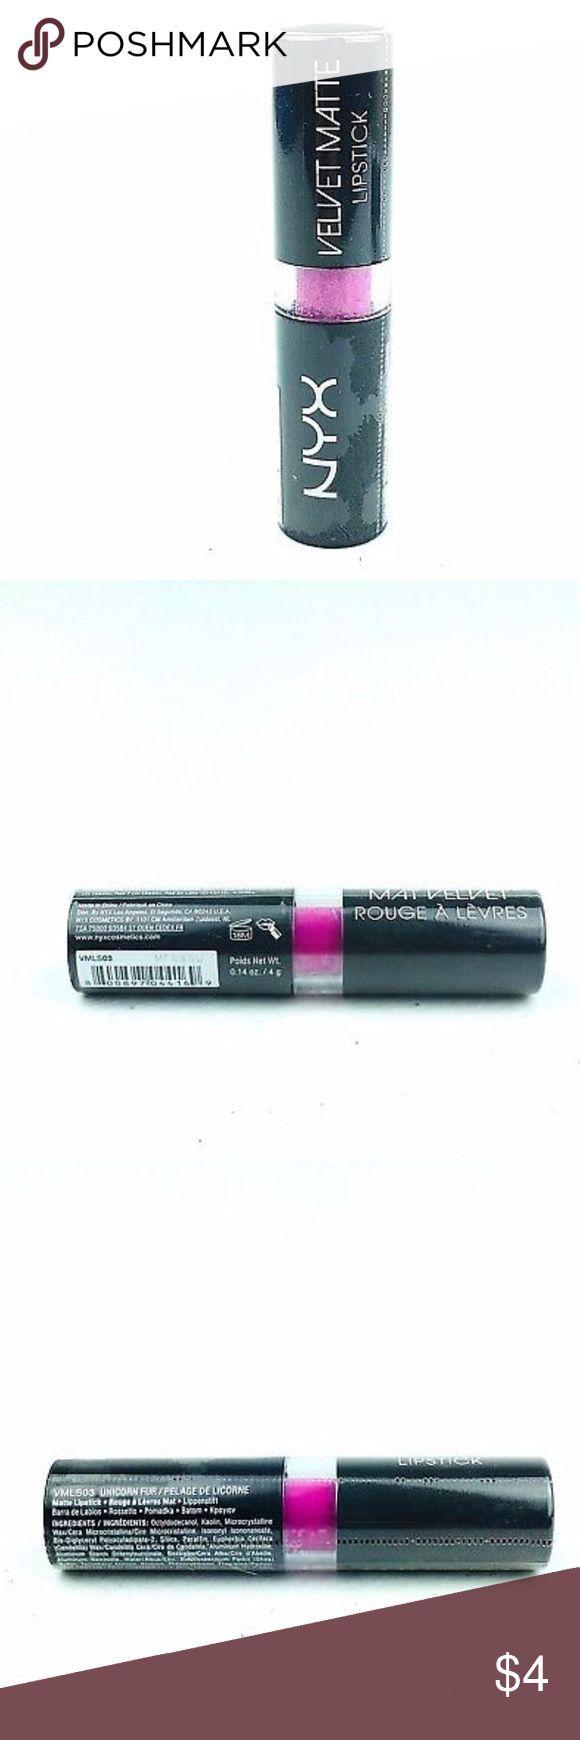 NYX Velvet Matte Lippenstift Einhorn Pink NYX Velvet Matte Lippenstift VMLS03 Einhorn … – Gesicht Schönheit